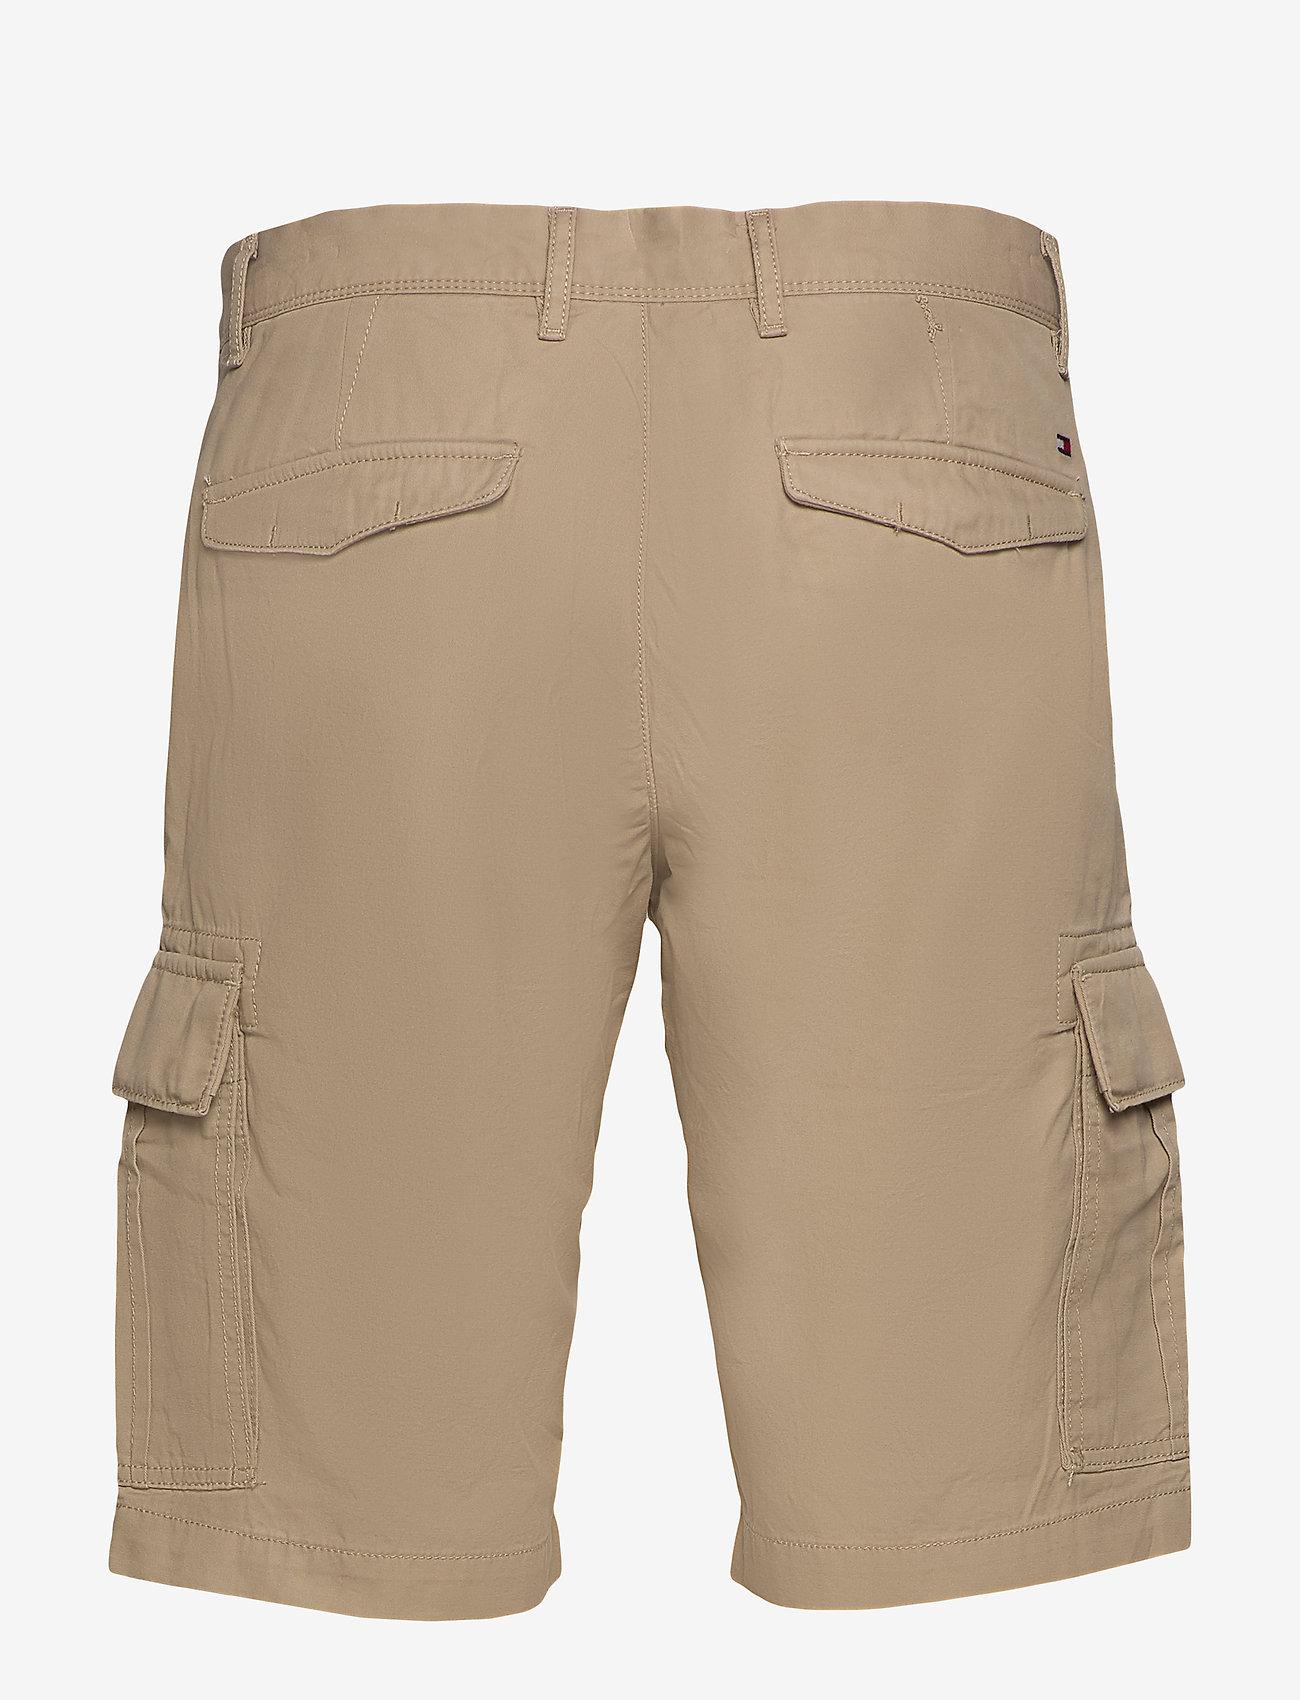 Tommy Hilfiger - JOHN CARGO SHORT LIGHT TWILL - cargo shorts - beige - 1